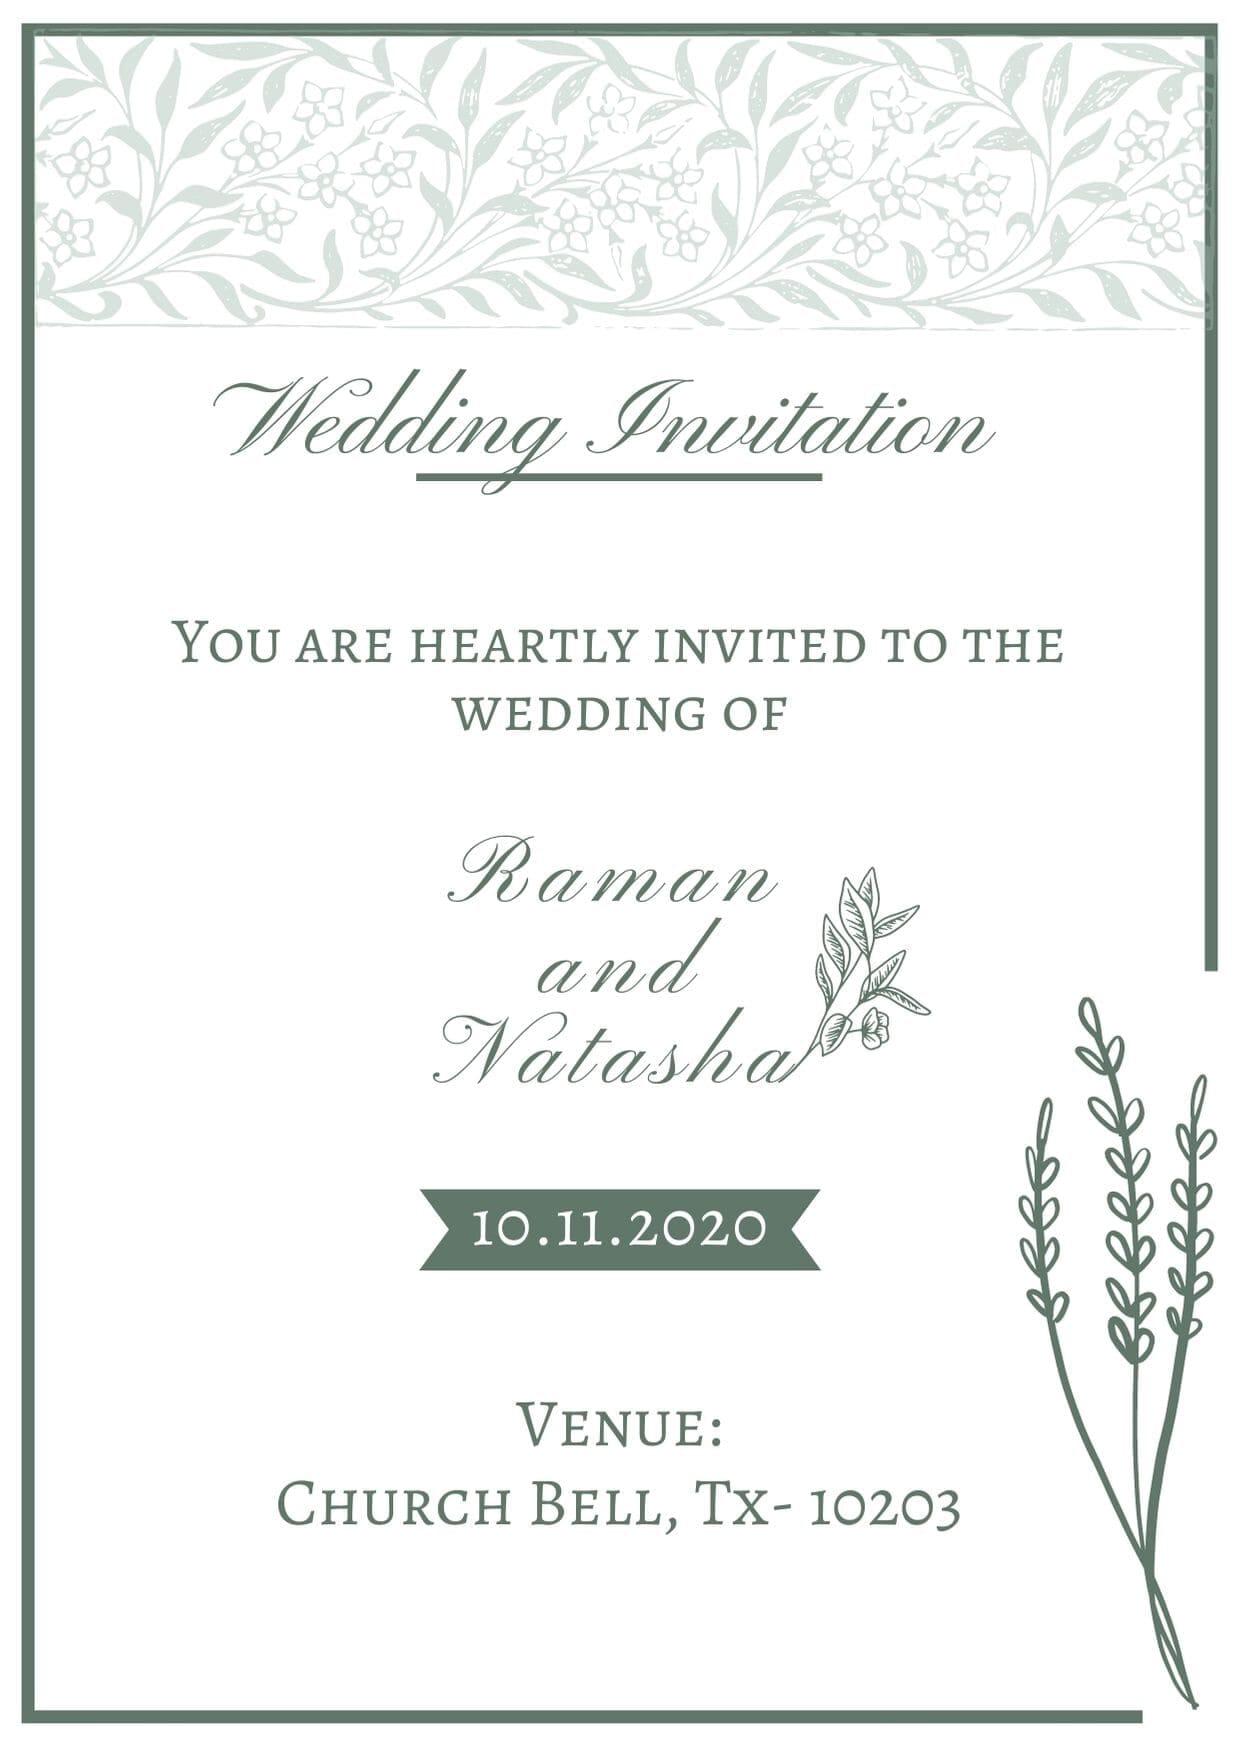 Free Wedding e-cards for Whatsapp